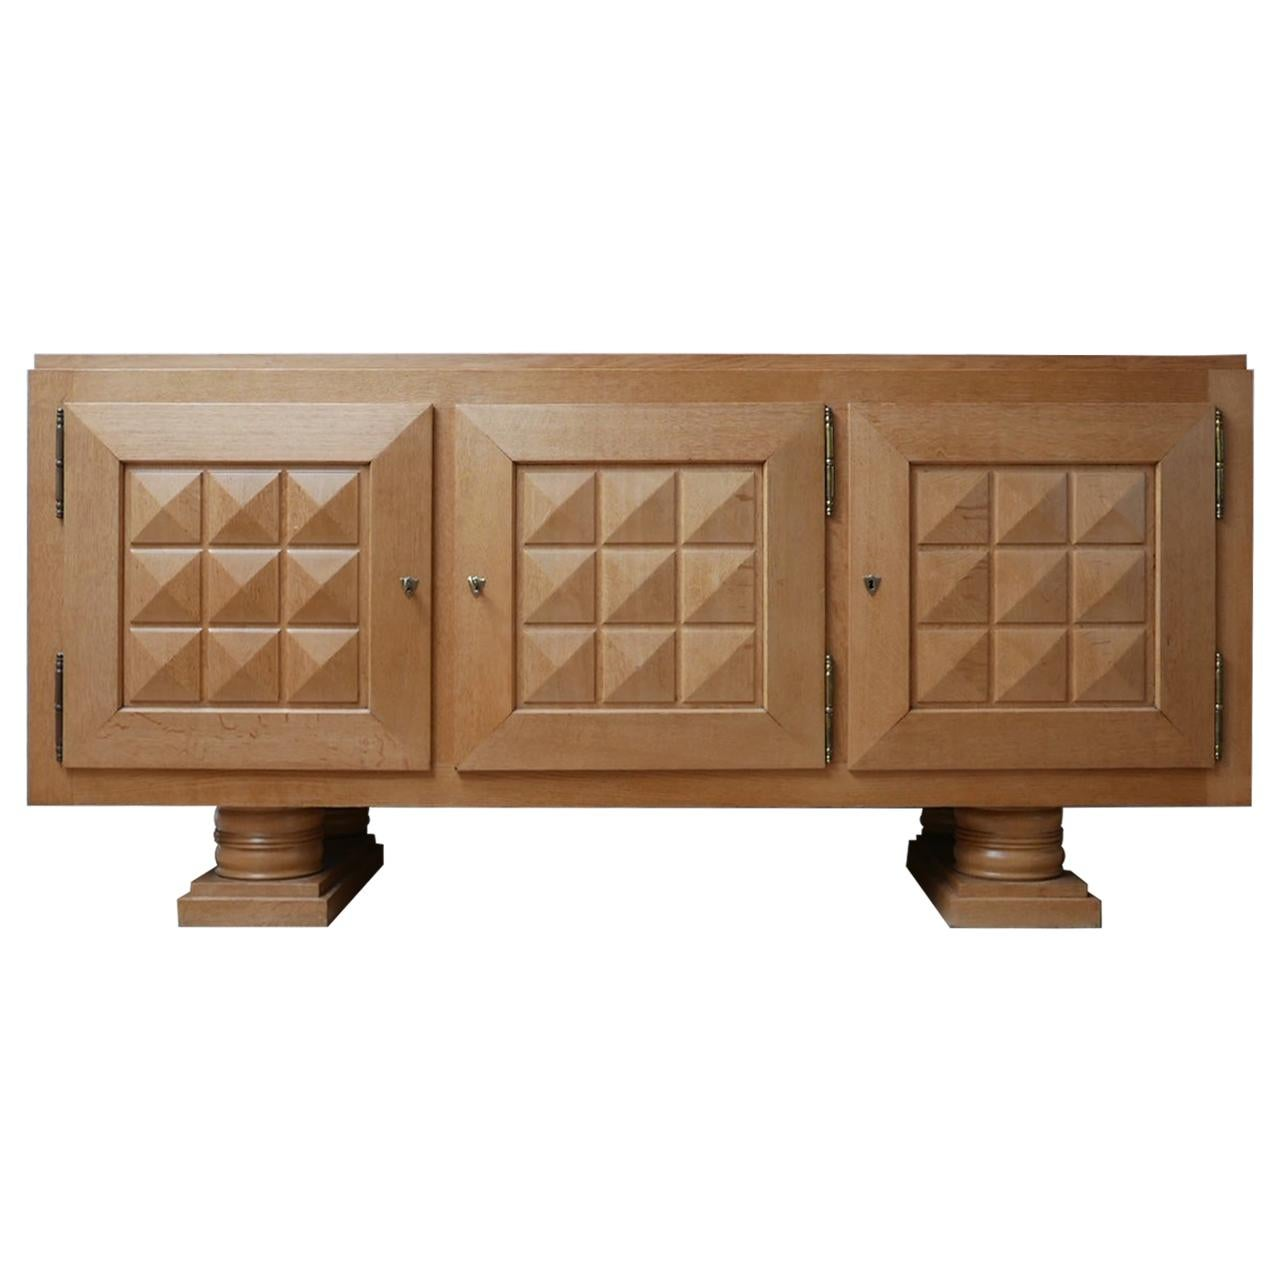 Art Deco Geometric Oak French Midcentury Credenza